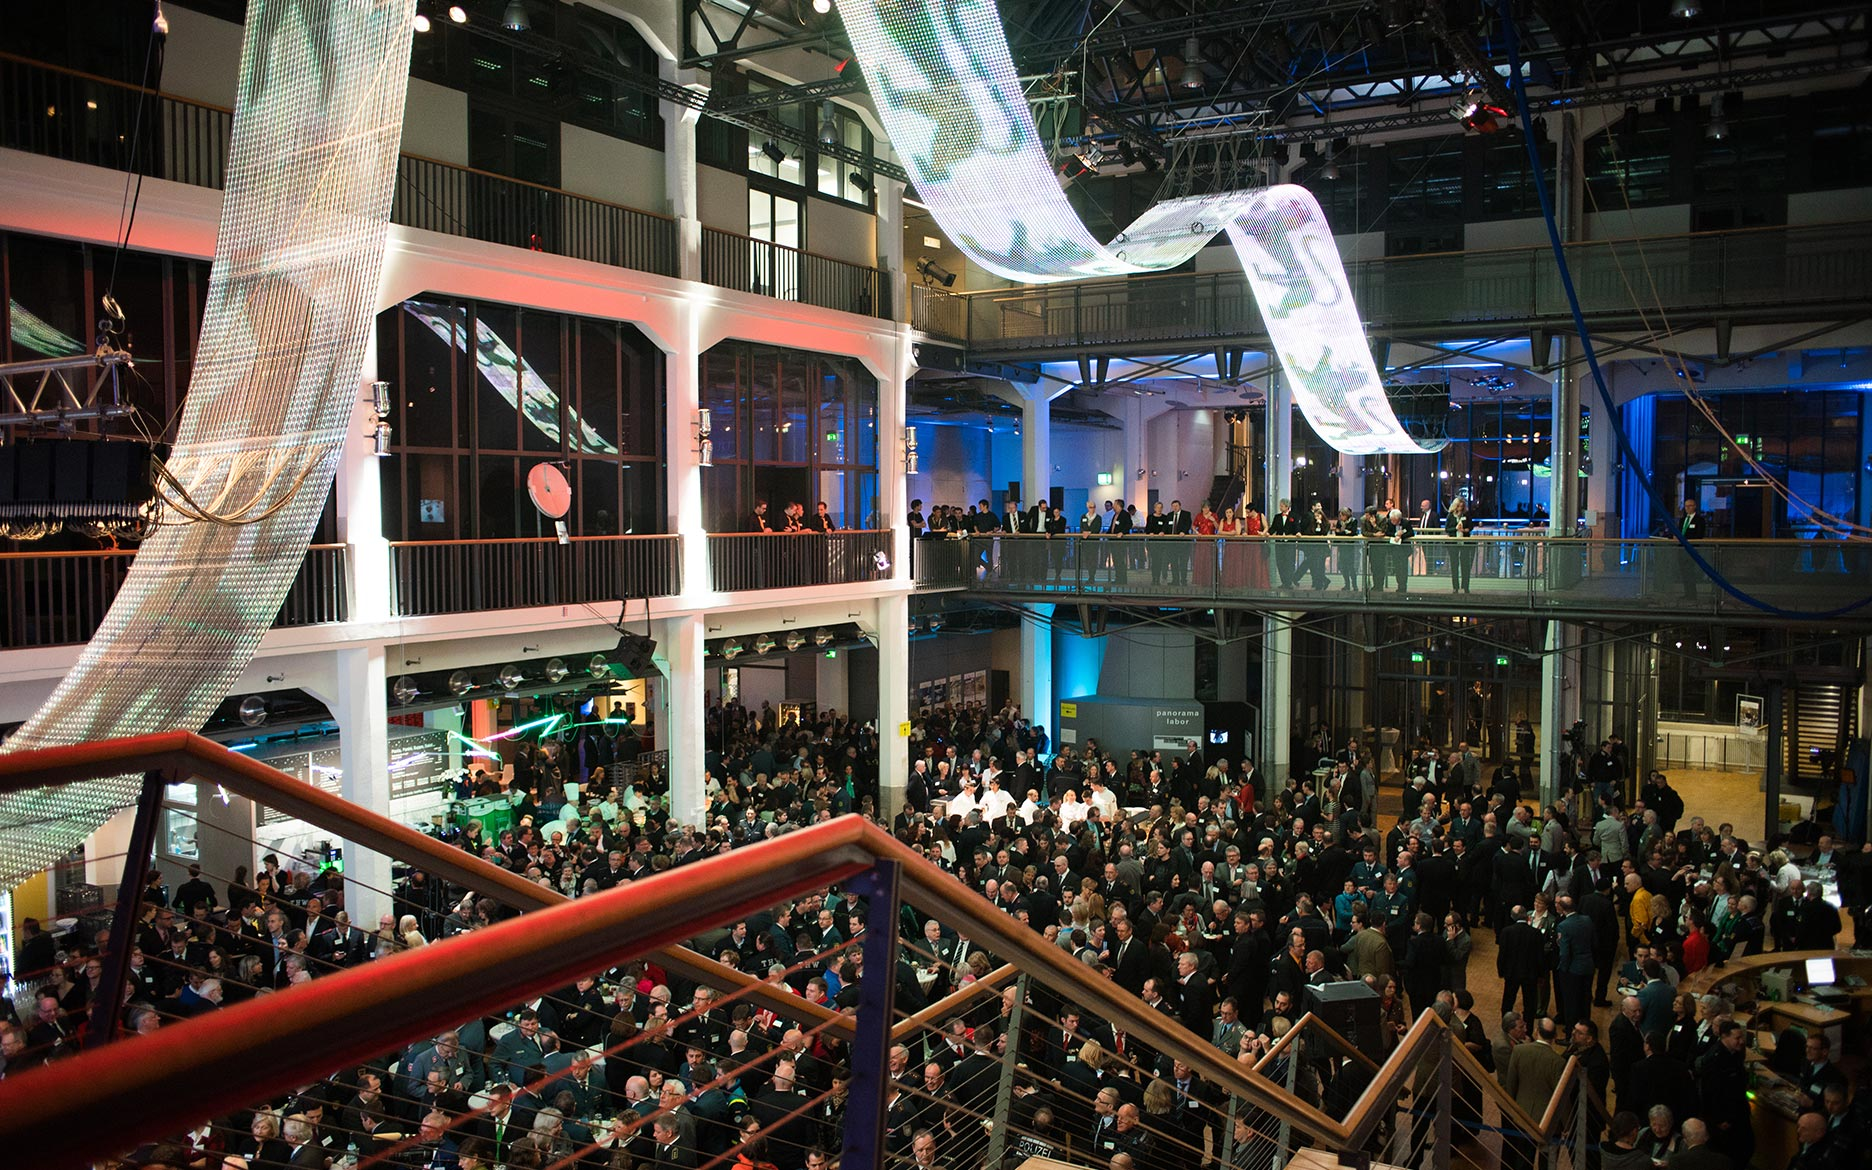 ZKM Karlsruhe, Neujahrsempfang 2016, LED-Welle